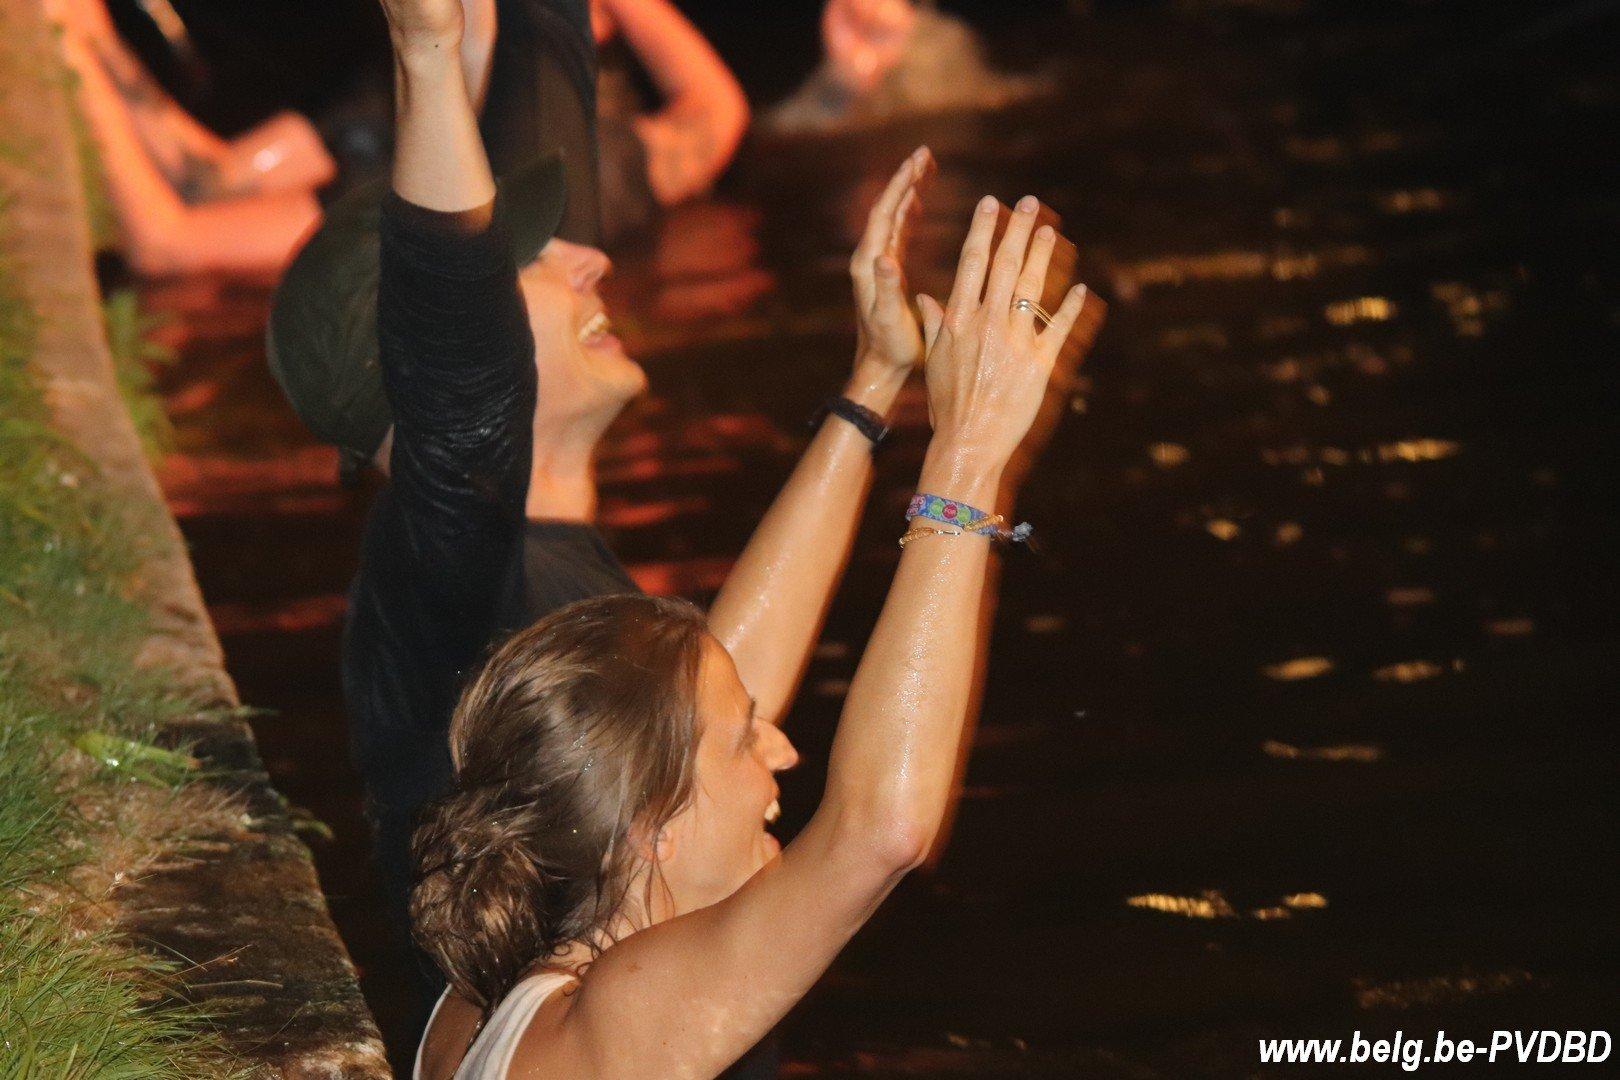 16e Vijverfestival Dilbeek groot succes - IMG 1420